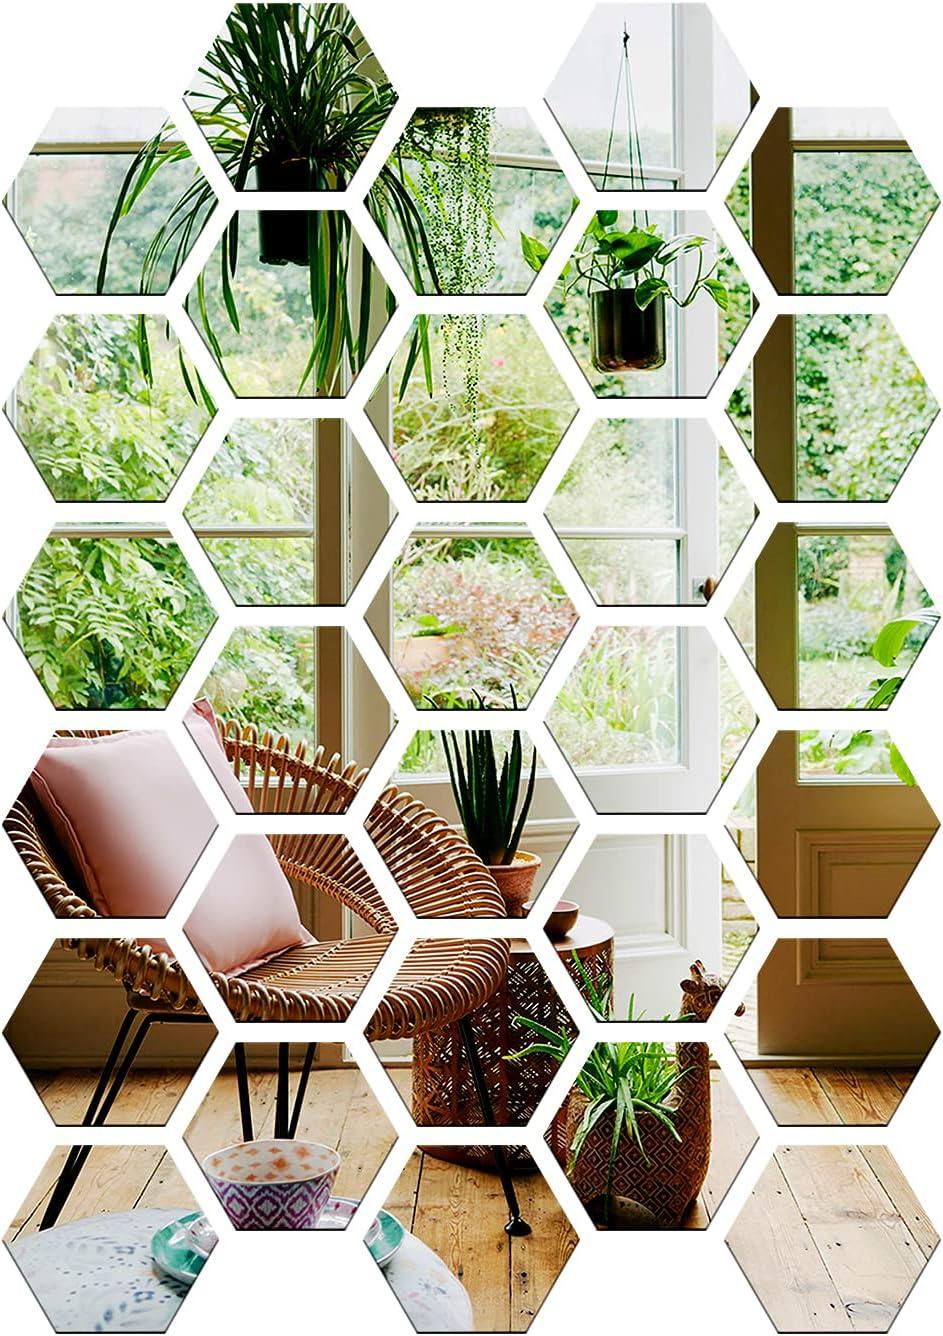 Gsmetog 7.3''x6.3''x3.6'' Hexagon Topics on TV Mirror Sticker Credence Pieces 30 Wall